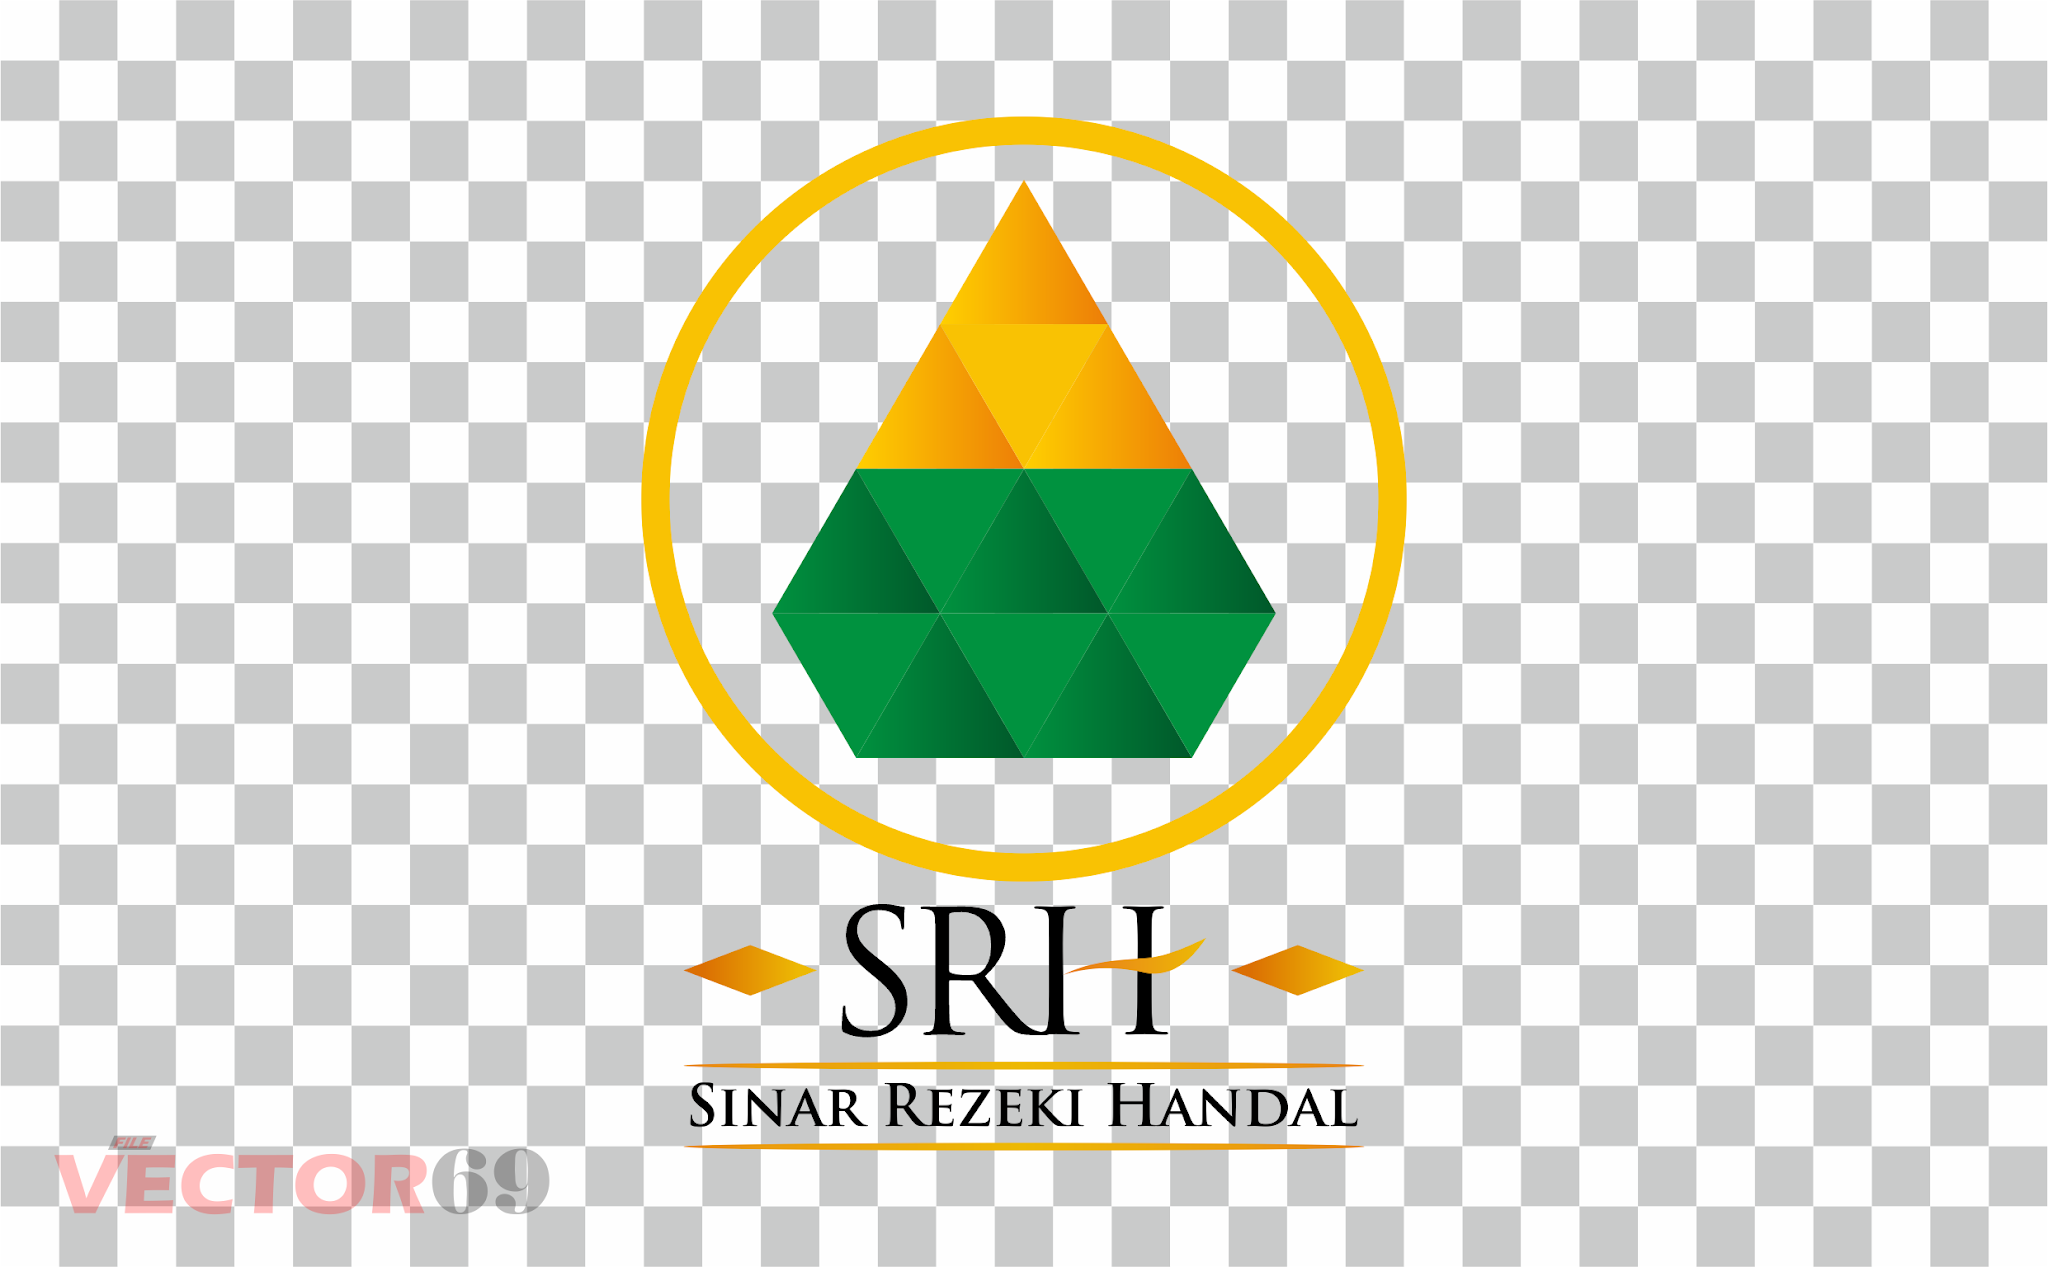 SRH (Sinar Rezeki Handal) Logo - Download Vector File PNG (Portable Network Graphics)